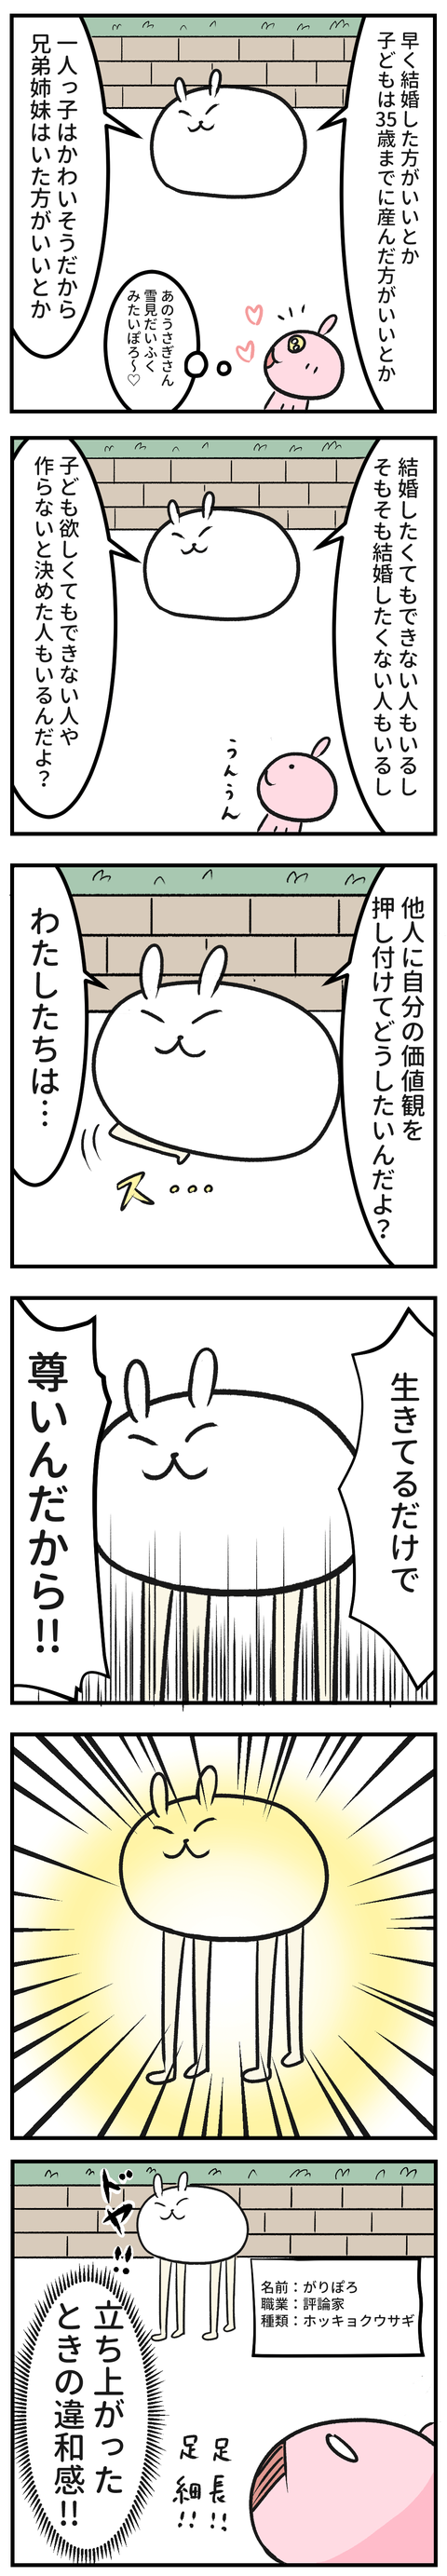 manga-yuzuporo15-1